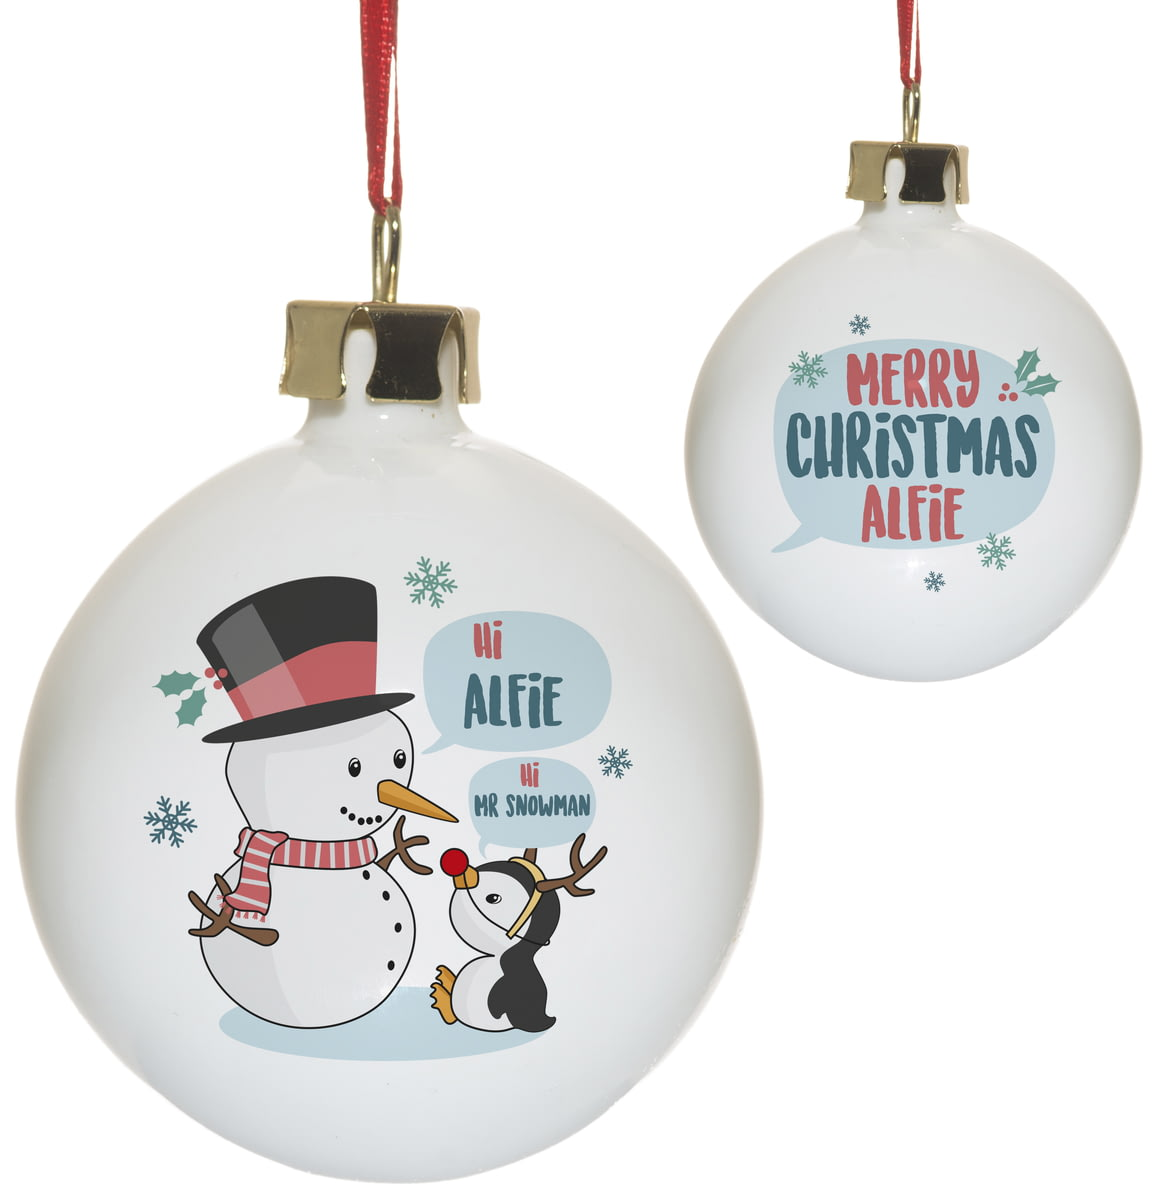 Personalised Mr Snowman Ceramic Christmas Tree Bauble